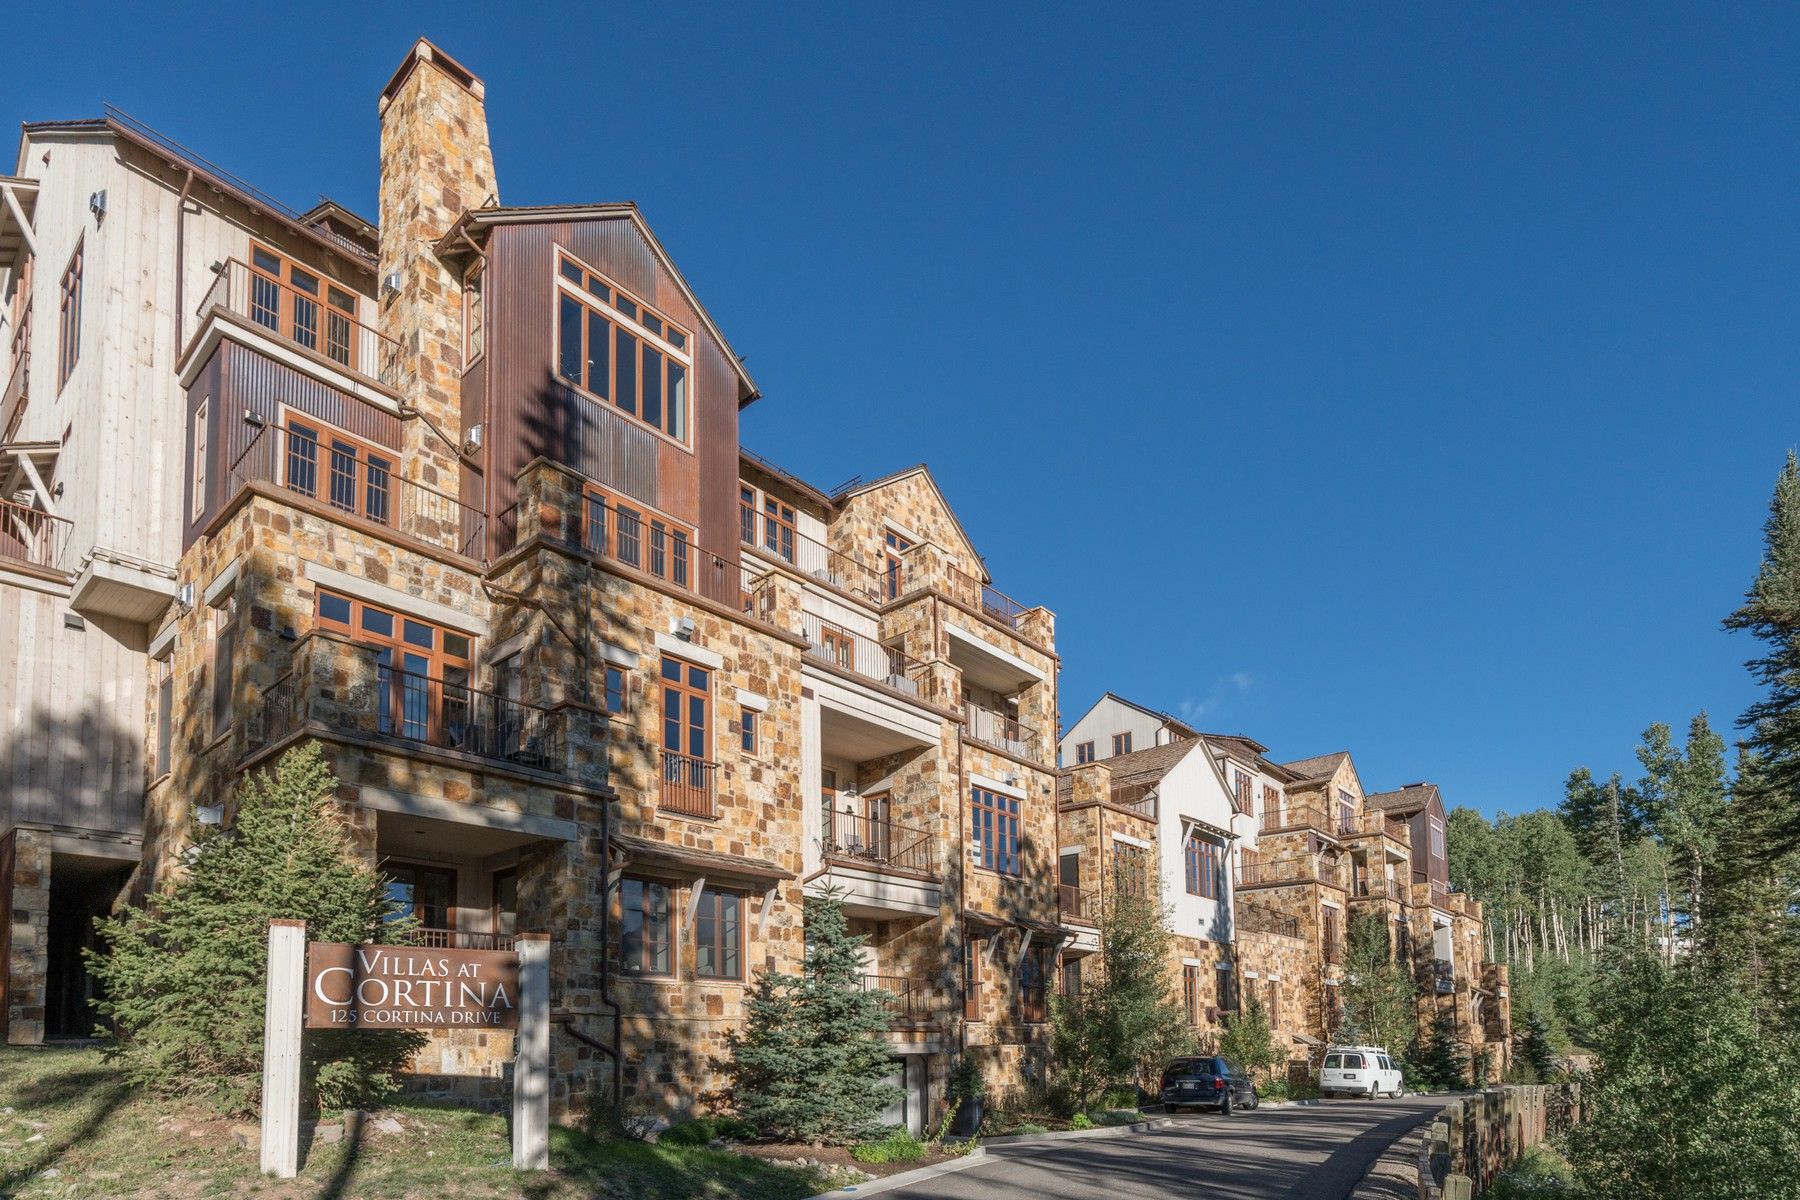 Single Family Homes for Sale at Villas At Cortina 125 Cortina Drive Unit 10 Mountain Village, Colorado 81435 United States